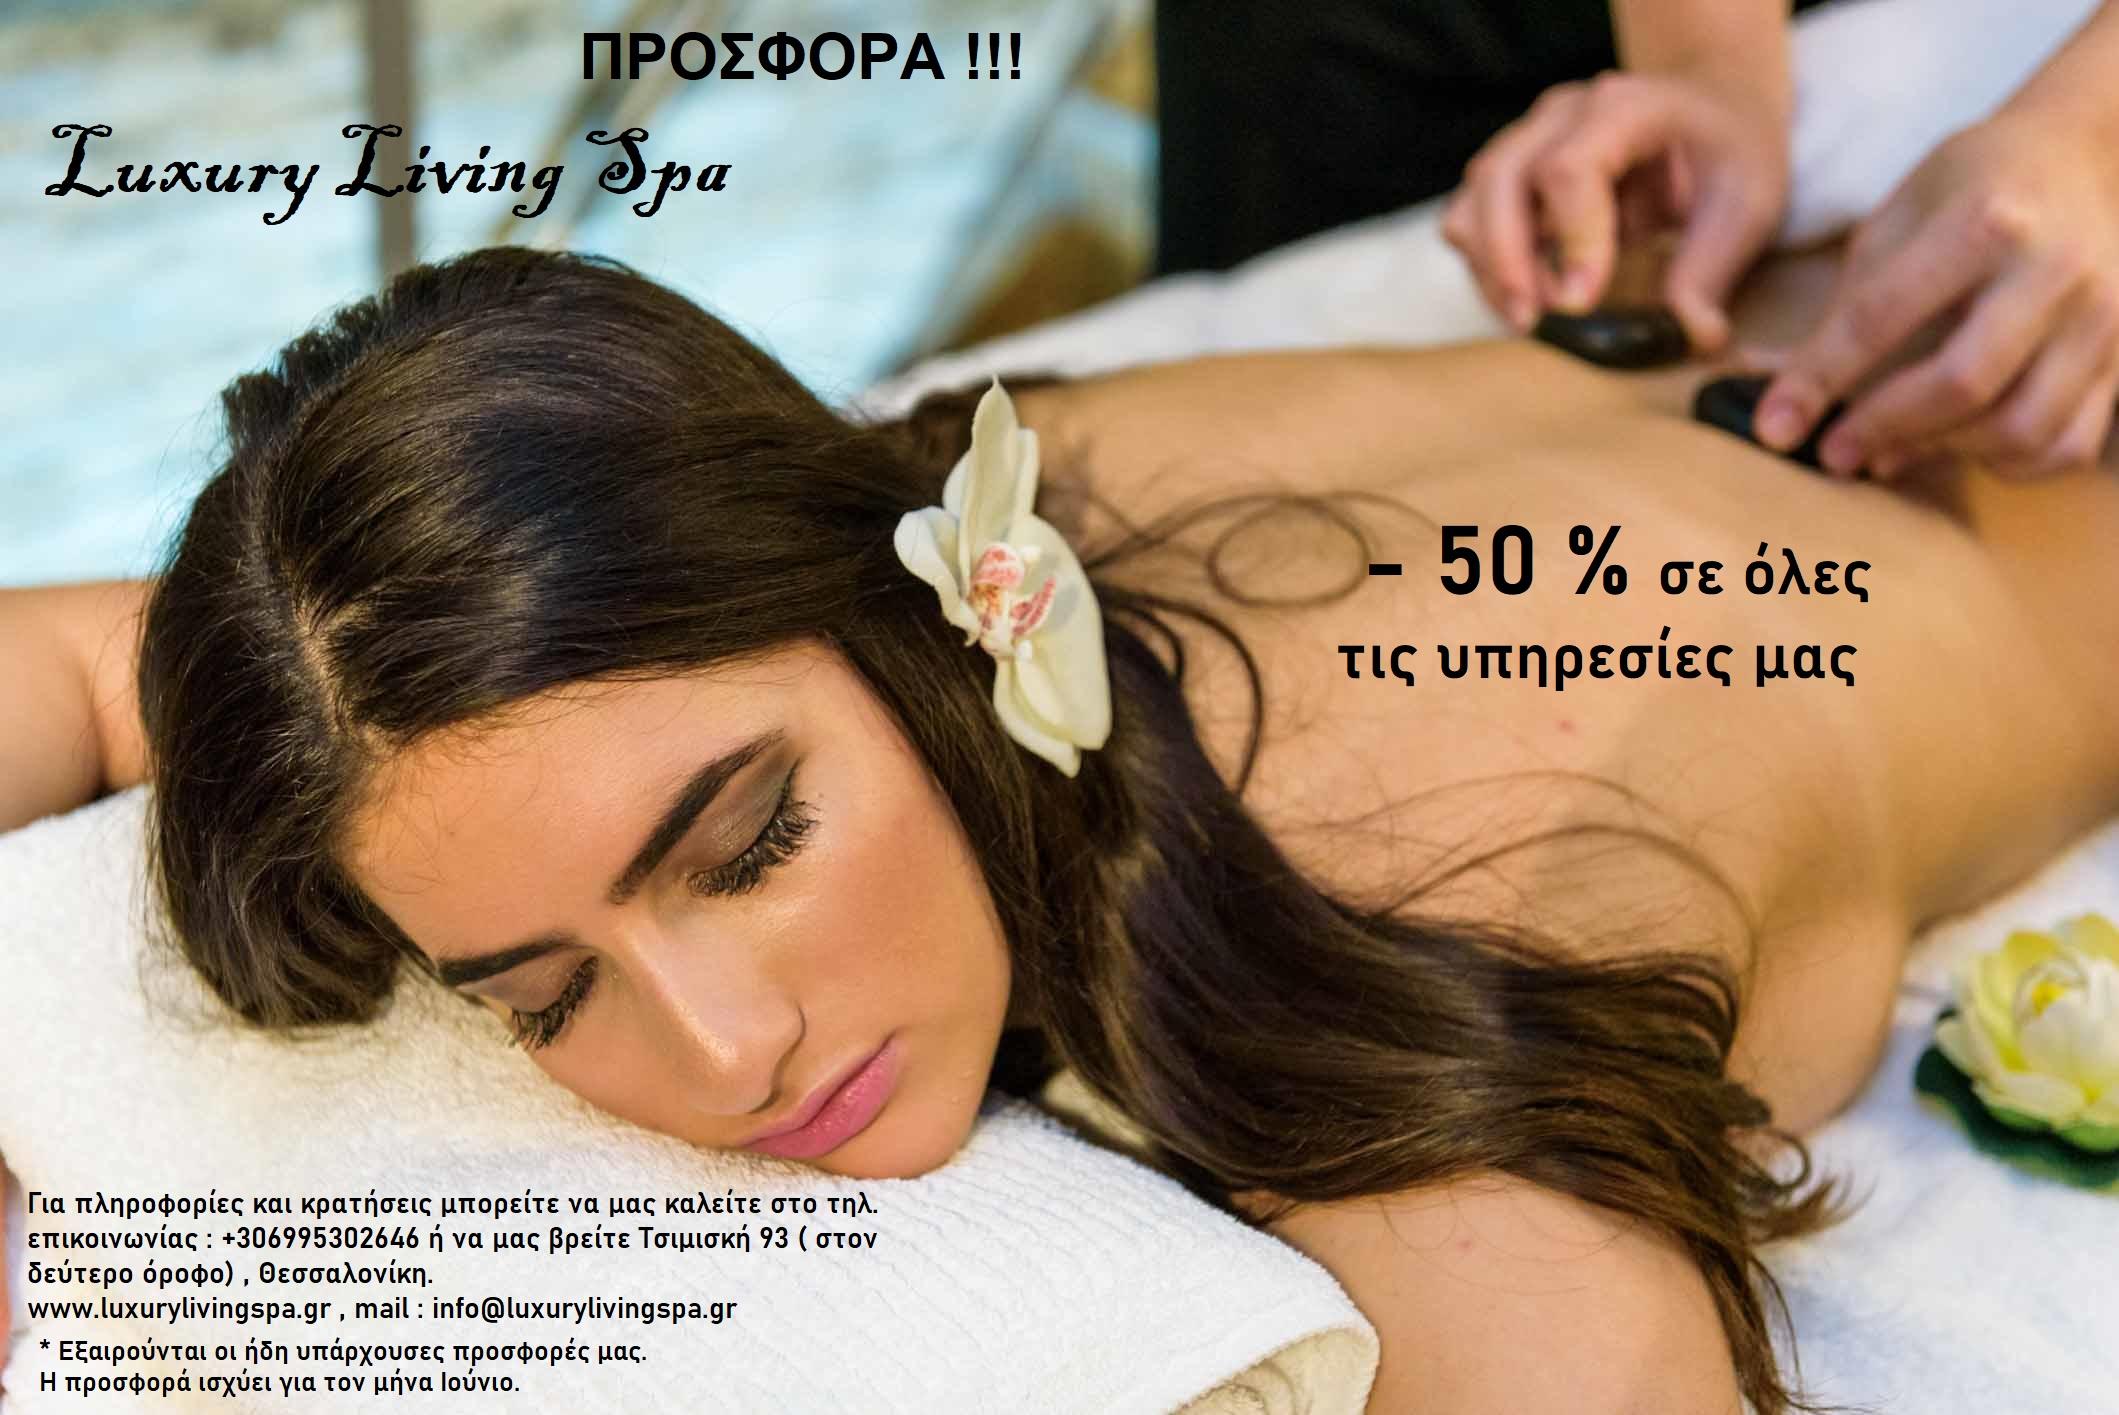 offer-4 Υπηρεσίες Μασάζ και SPA Θεσσαλονίκη